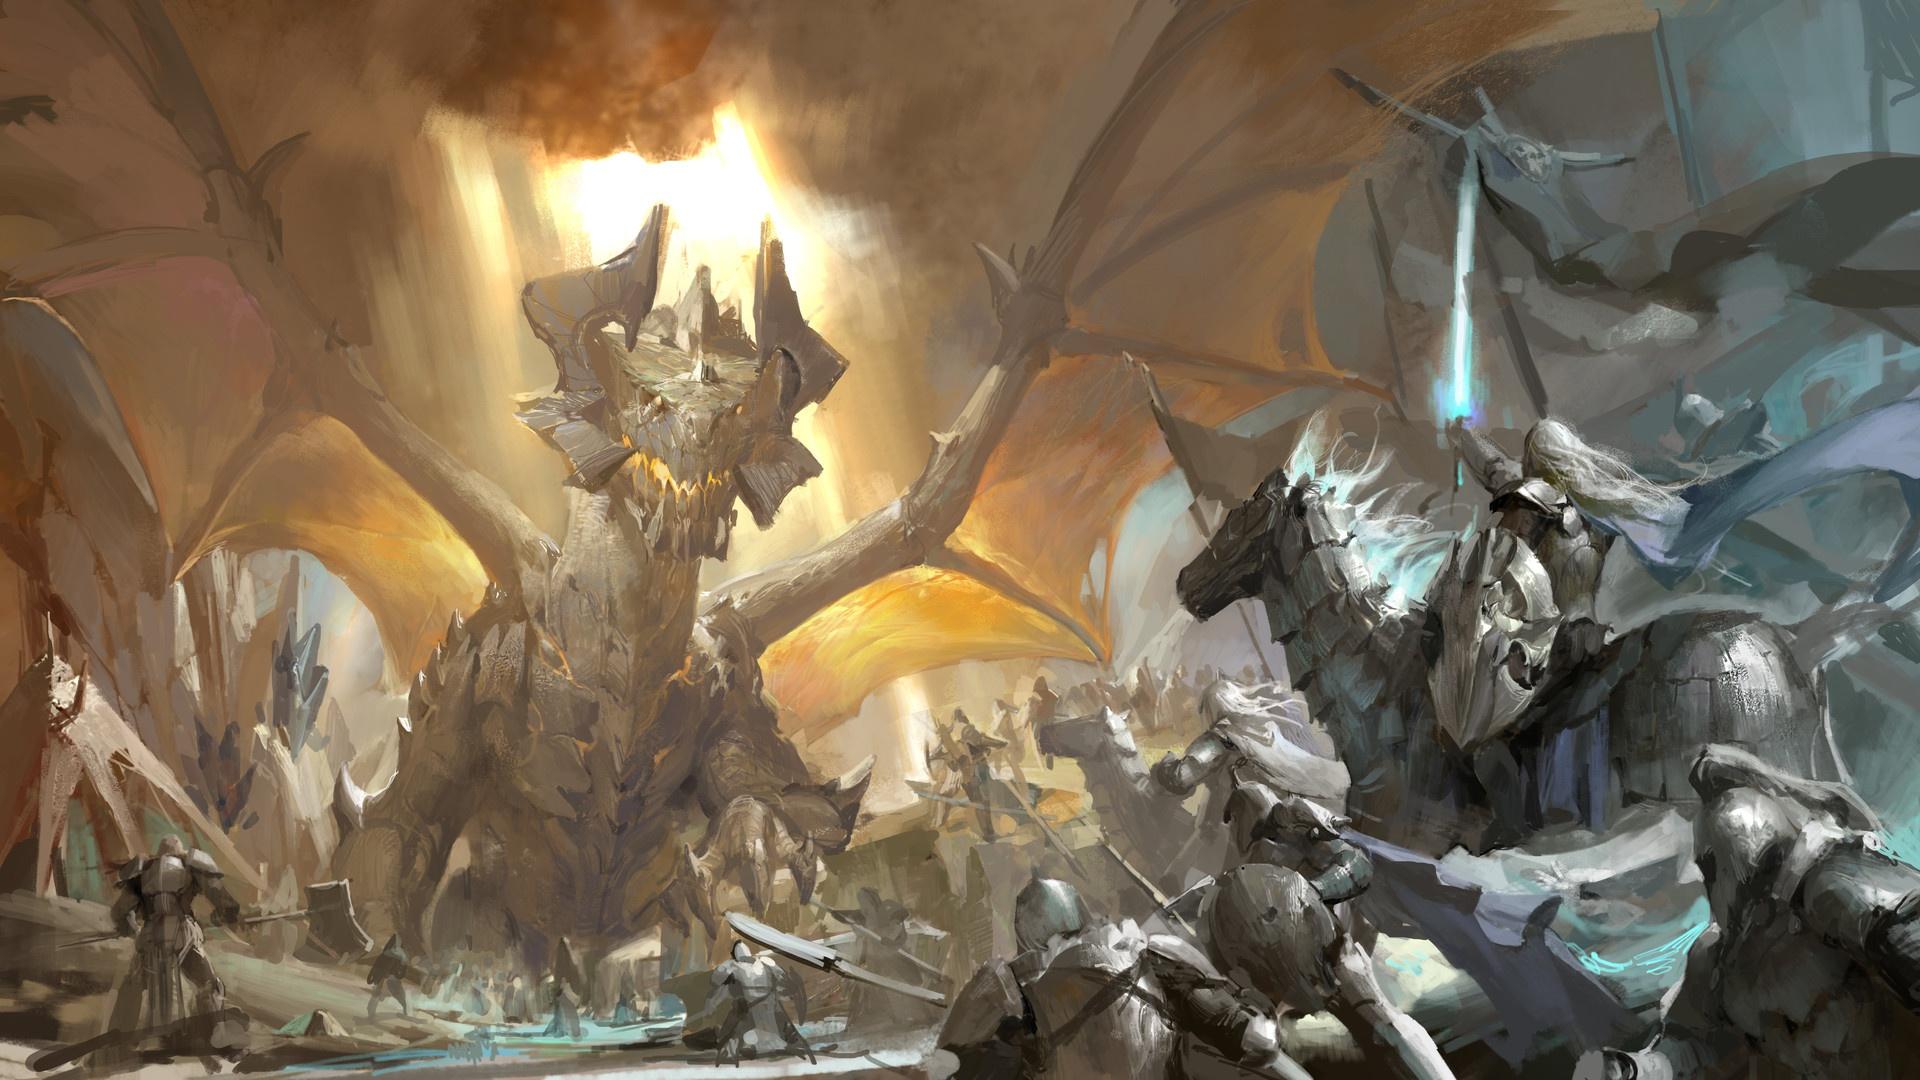 Download Fantasy Dragons Image Wallpapers